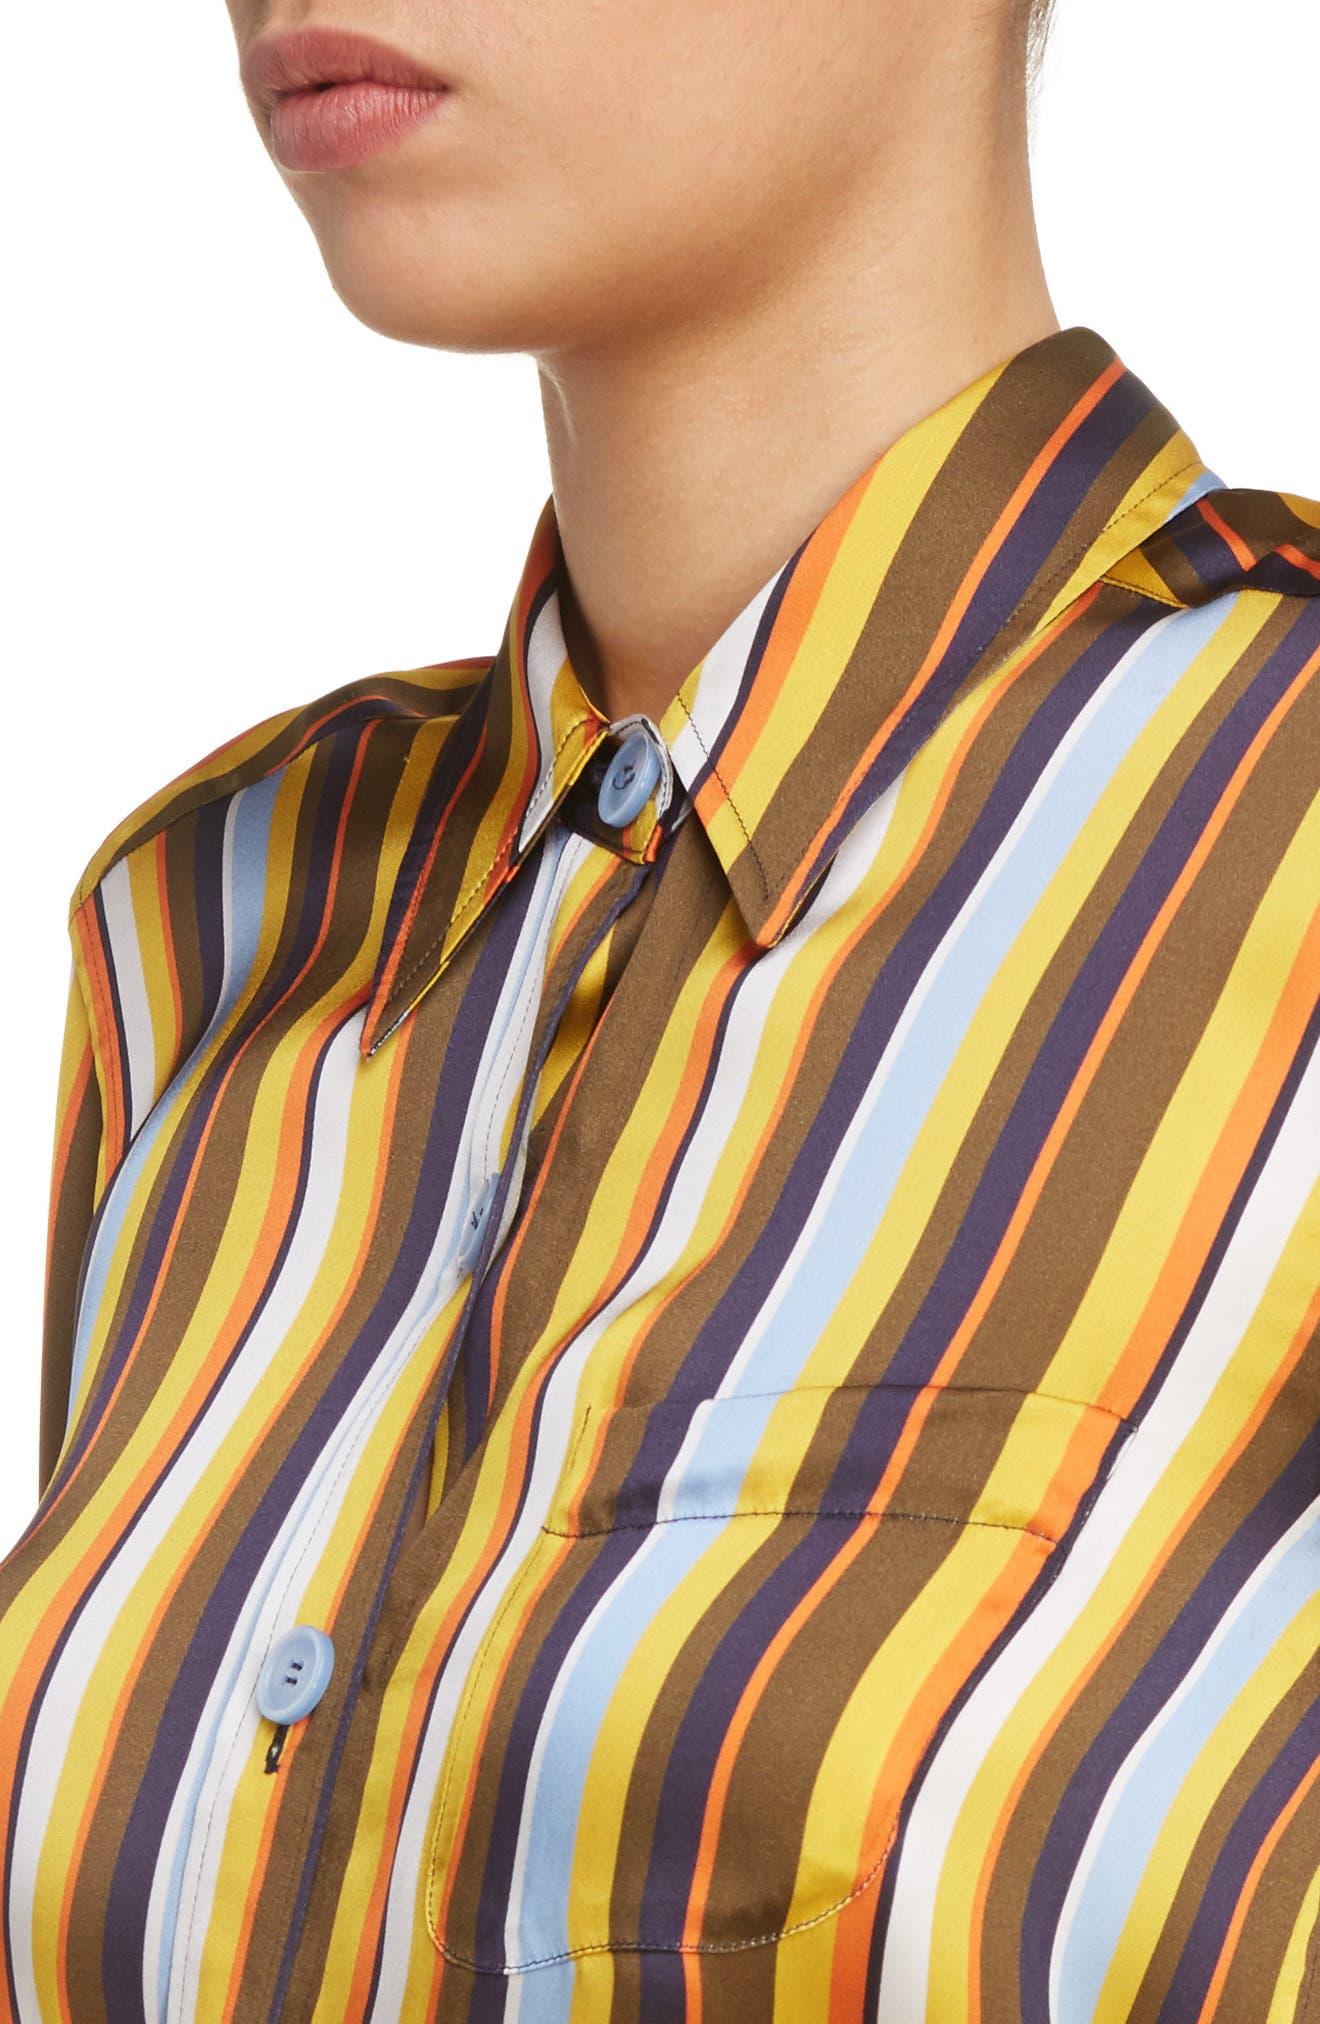 Buse Multistripe Blouse,                             Alternate thumbnail 5, color,                             Multi Stripe Brown